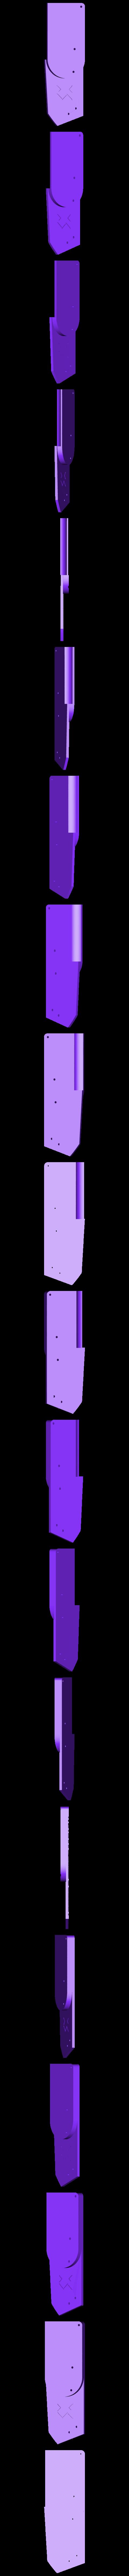 14_FCC_Plaque1.stl Download free STL file Ymir - Airsoft Shotgun/grenade launcher • 3D print design, Snorri